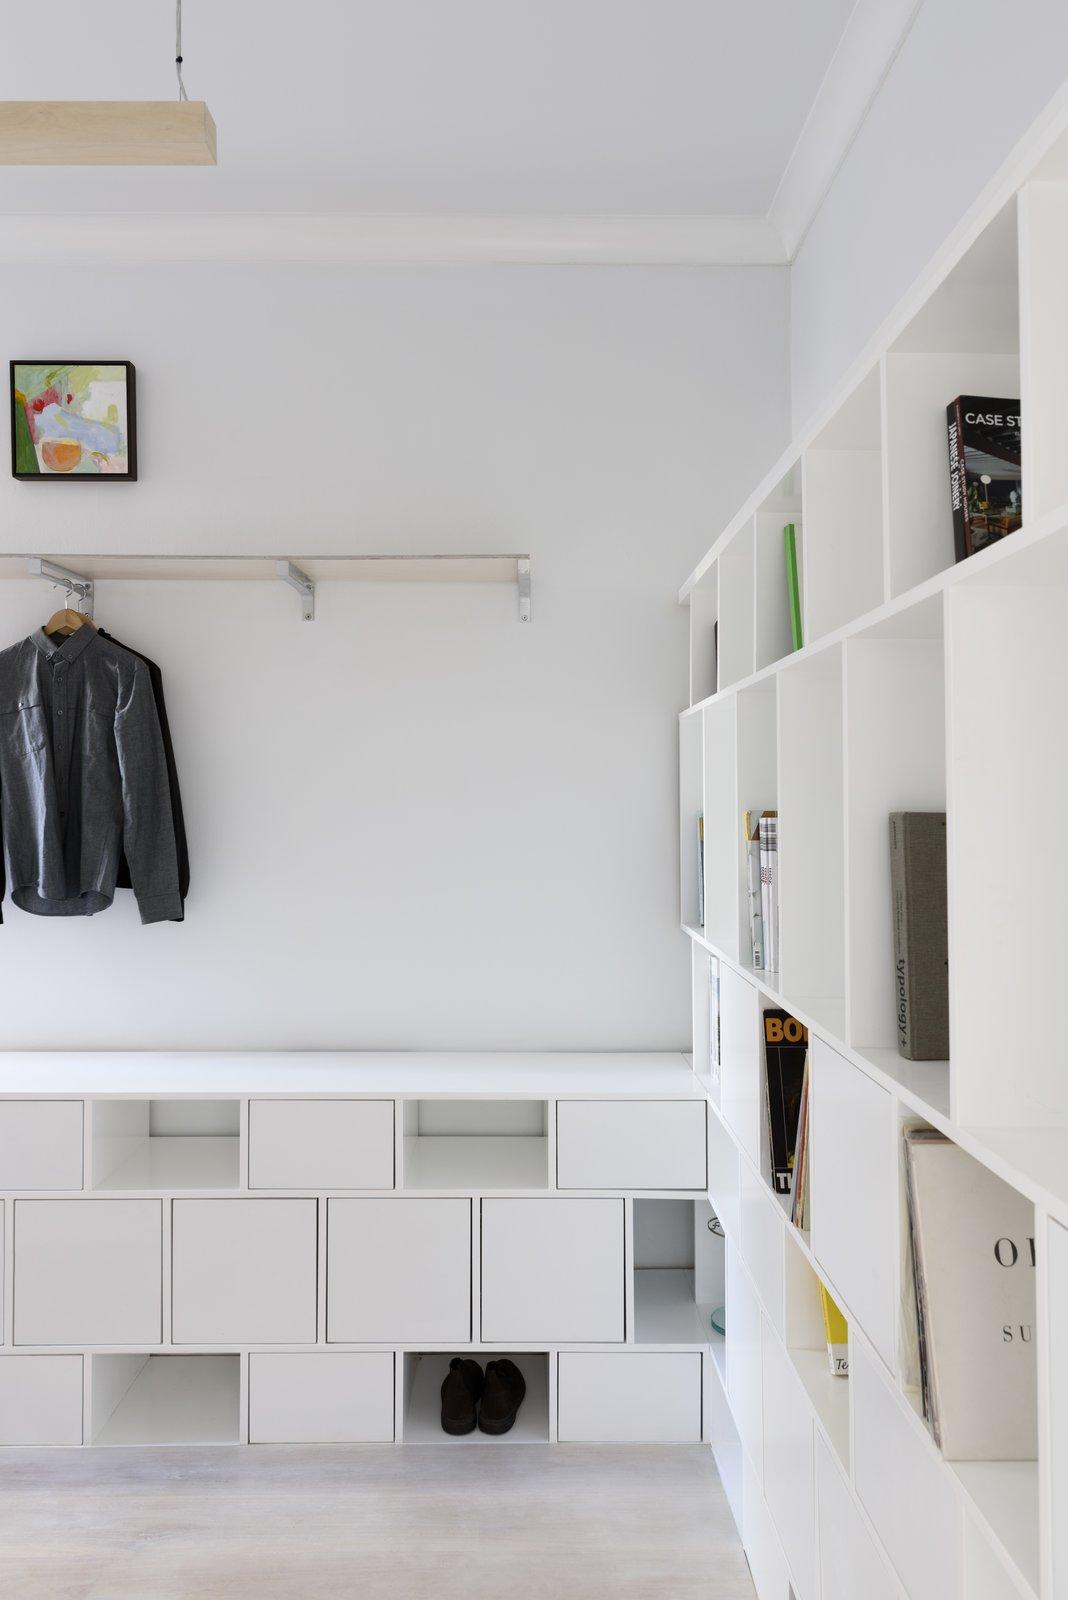 Shelves Storage Type, Shelves, Storage, Bookcase, Pendant Lighting, Light Hardwood Floor, and Bedroom Bedroom cabinetry  Curtain Cottage